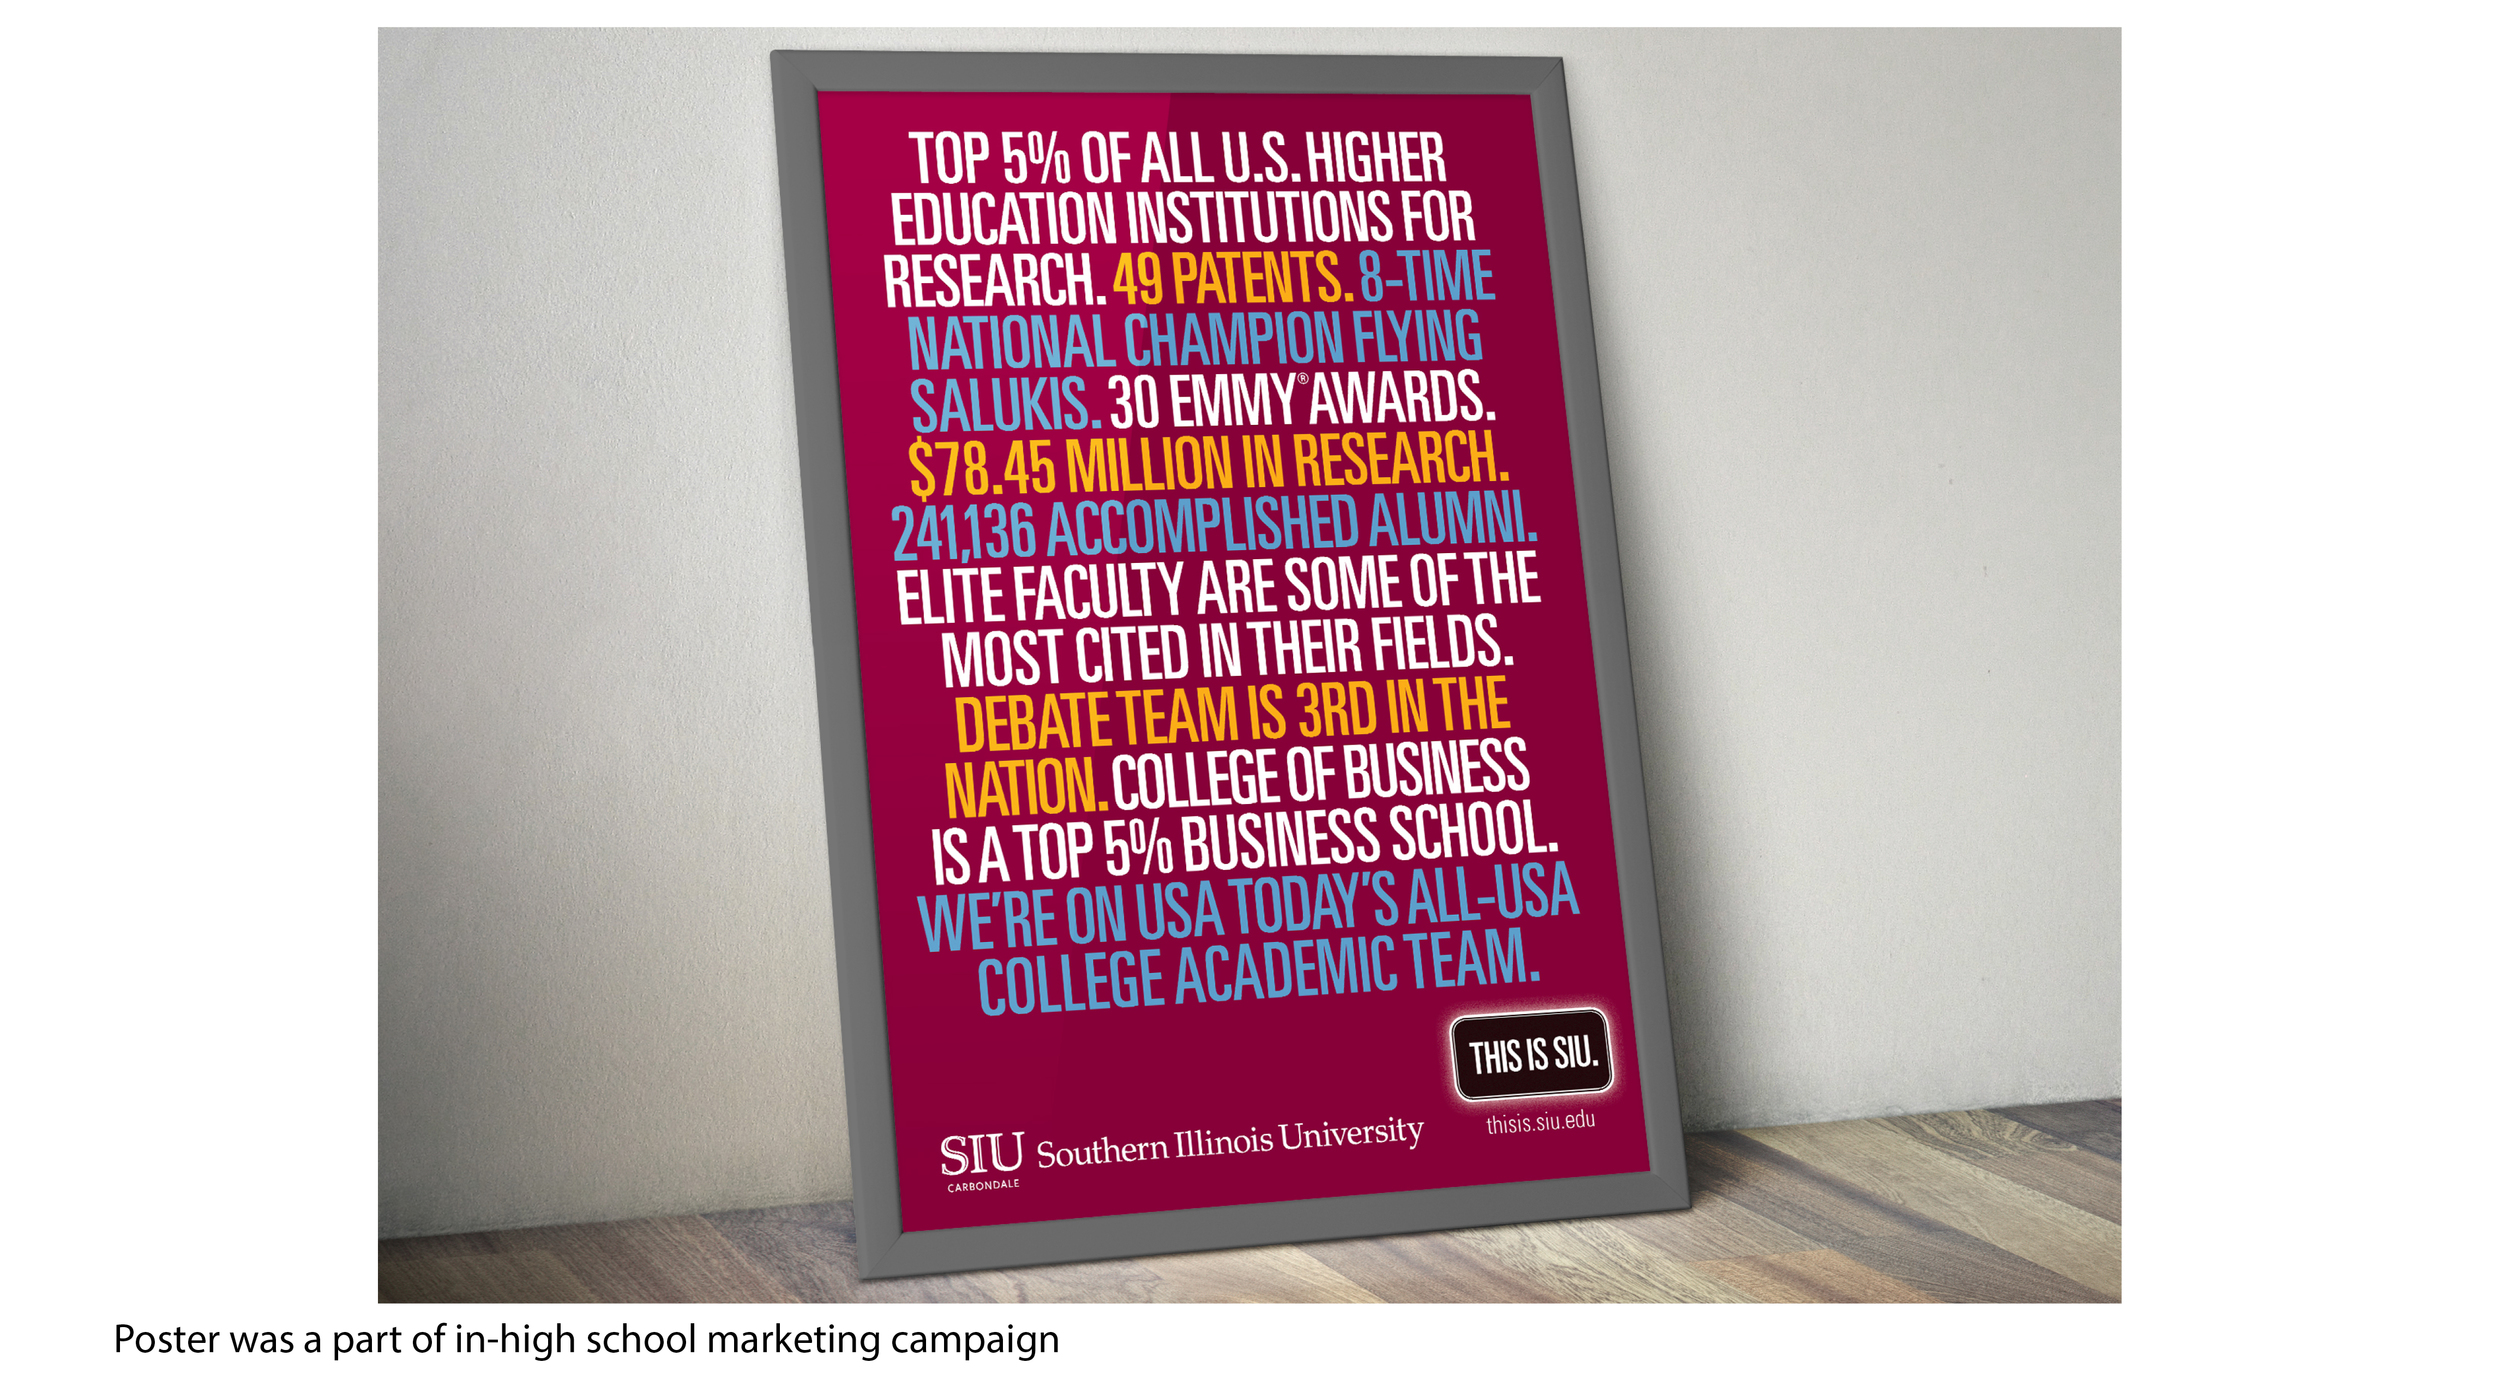 SIU_Marketing+AdvertisingSlides6.jpg